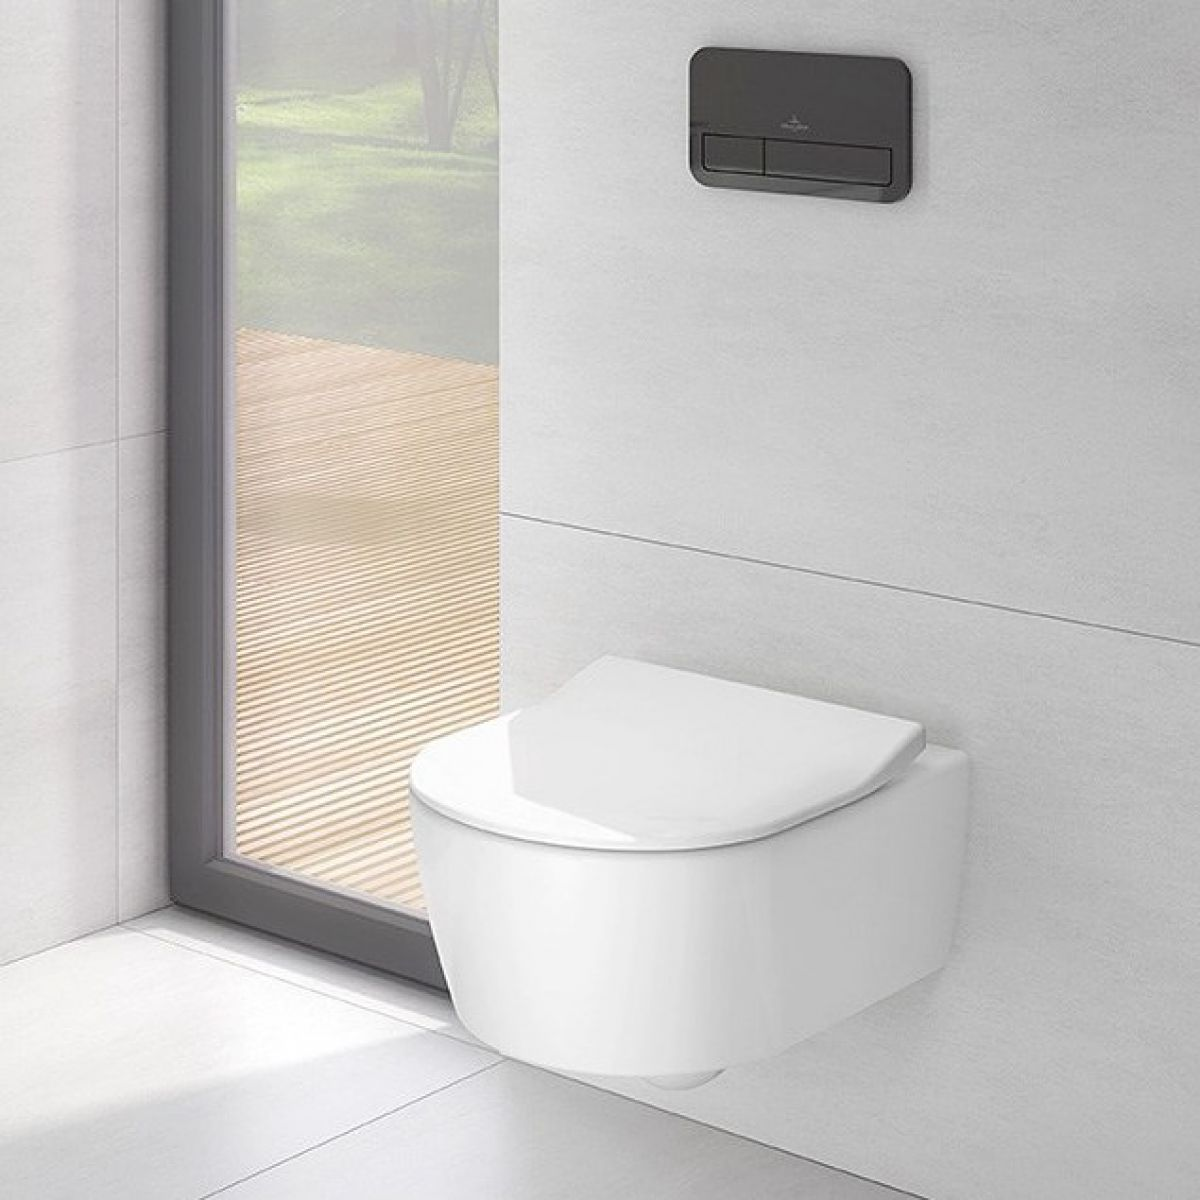 Villeroy Boch Avento Wall Mounted Toilet Rimless Toilet Bathroom Wall Mounted Toilet Bathrooms Direct Villeroy Boch